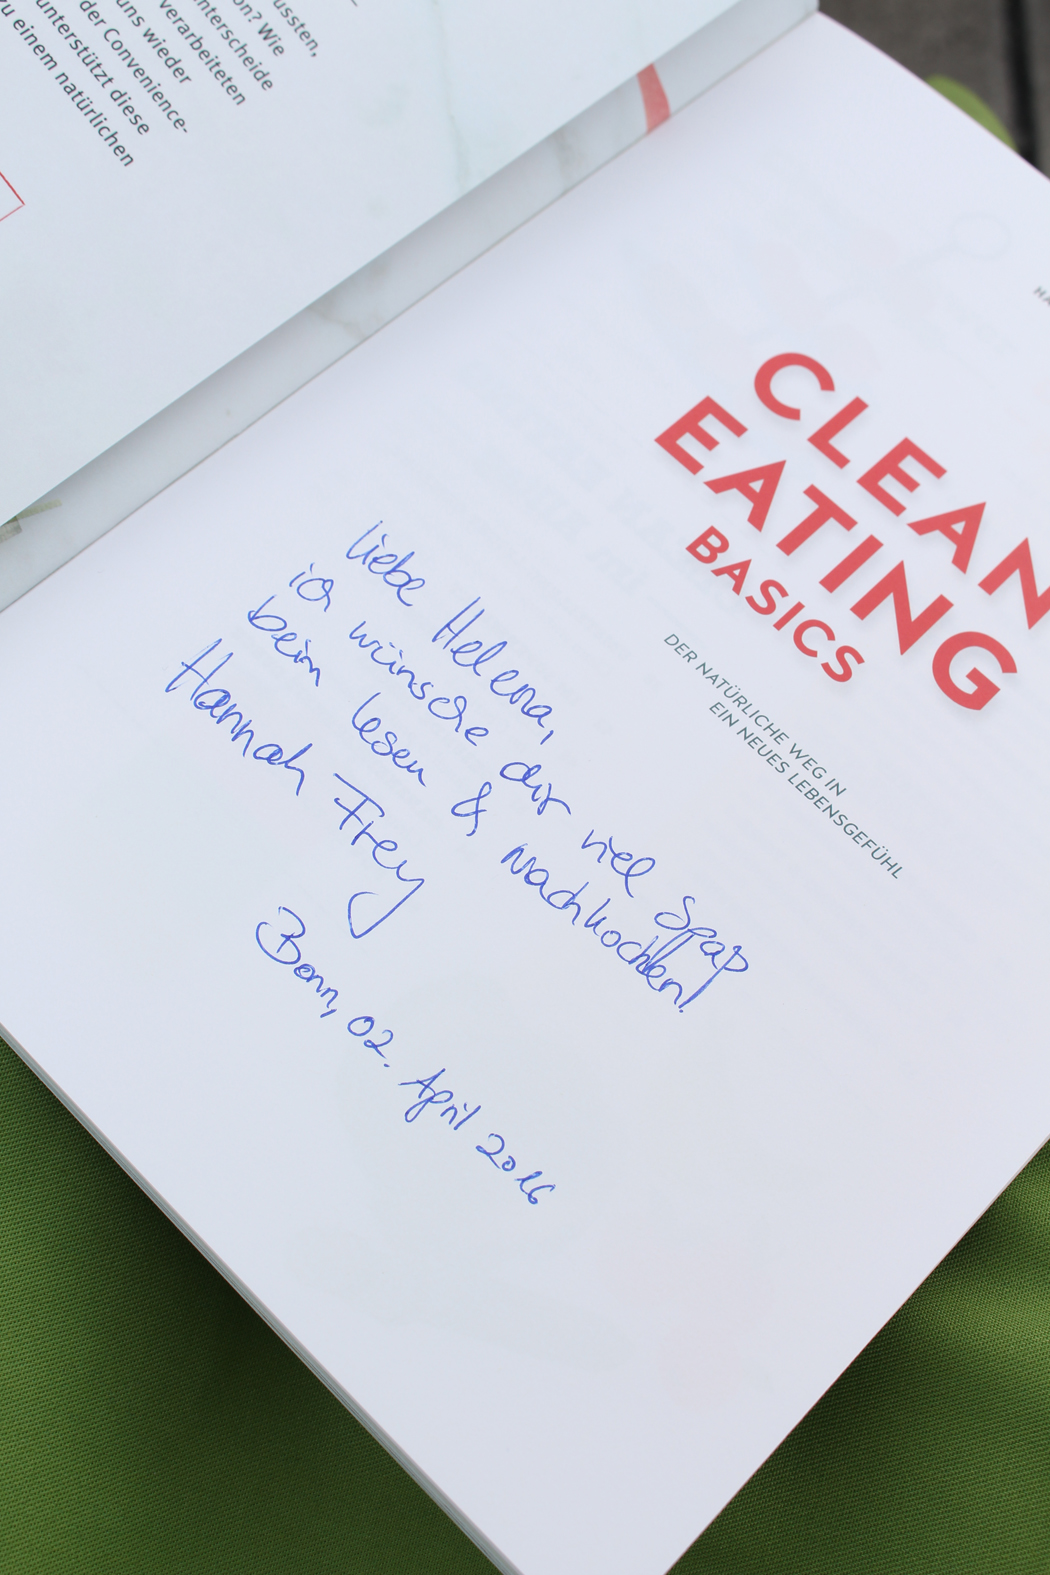 Clean Eating Basics Workshop Chefkoch29